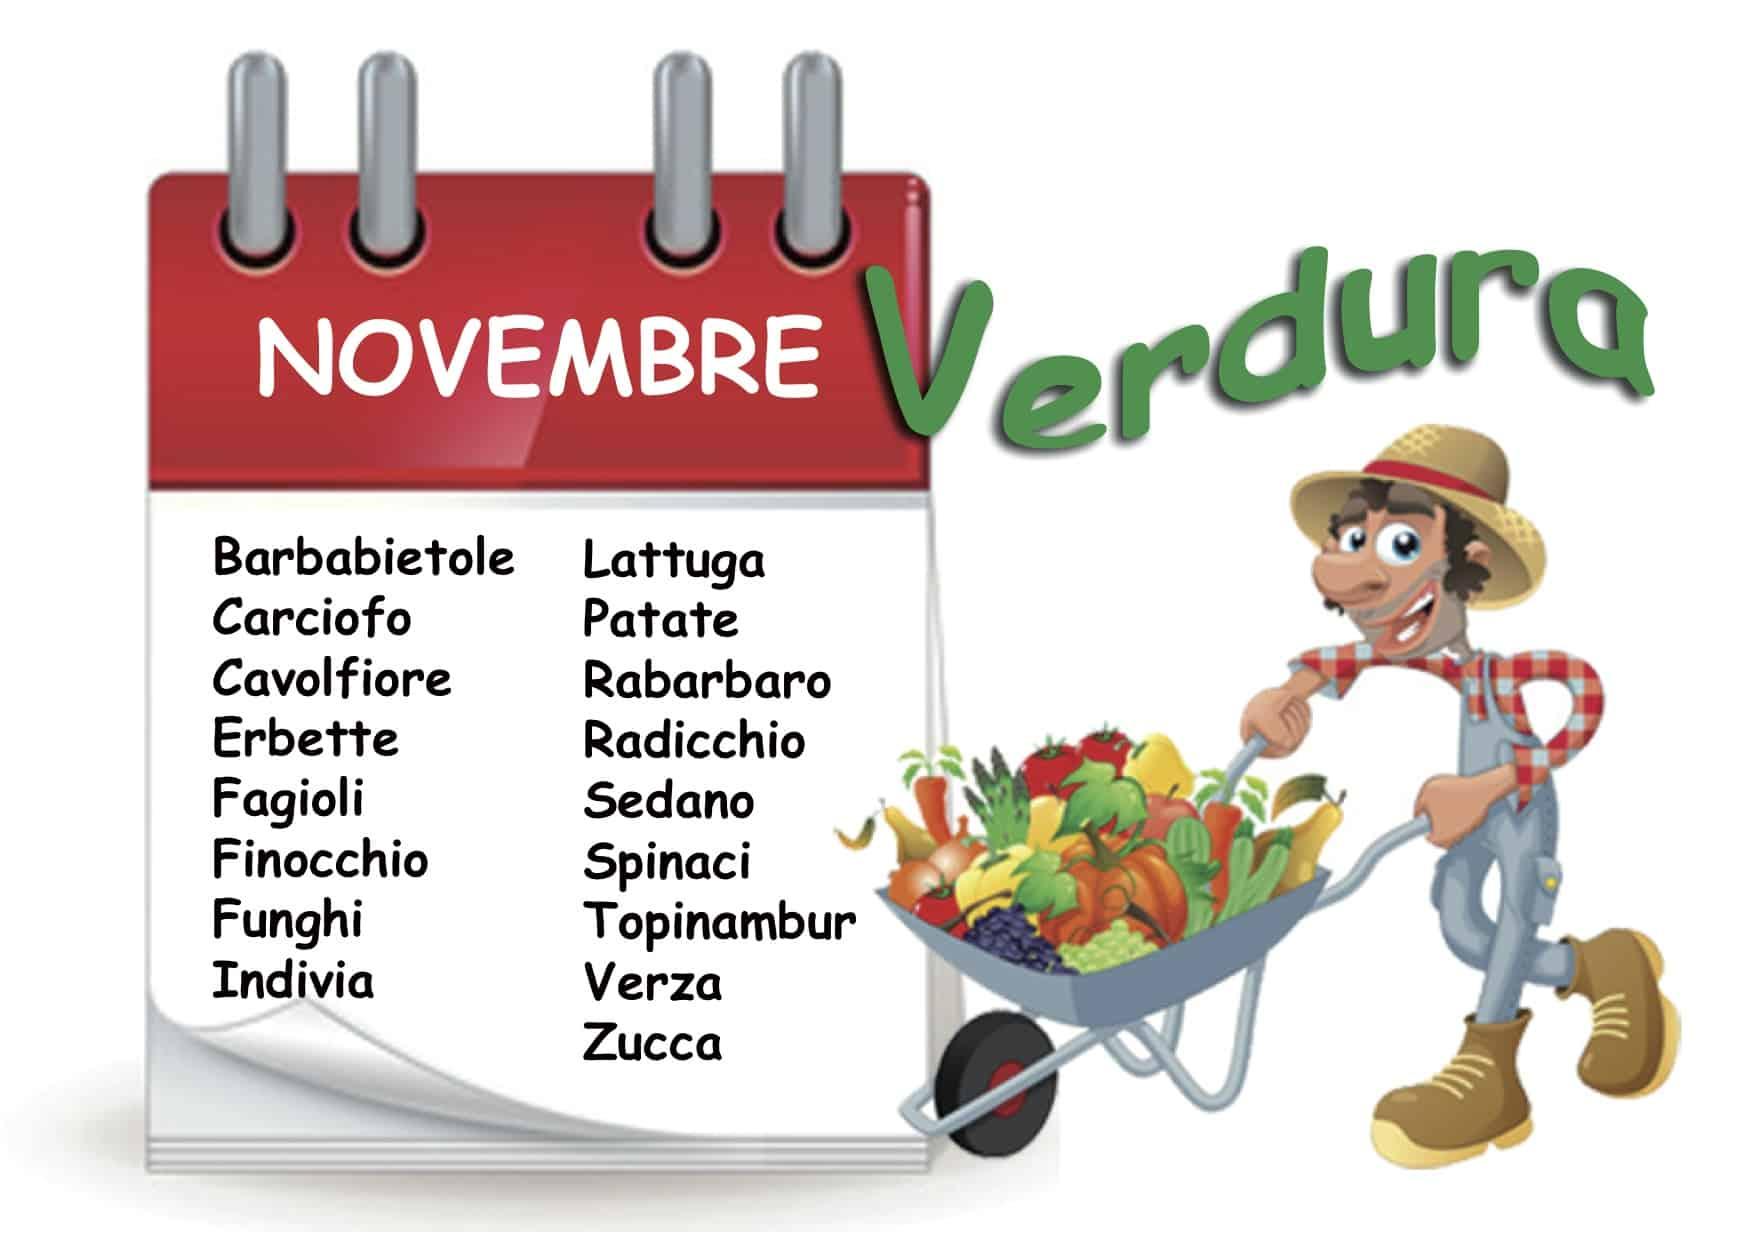 Le verdure di novembre